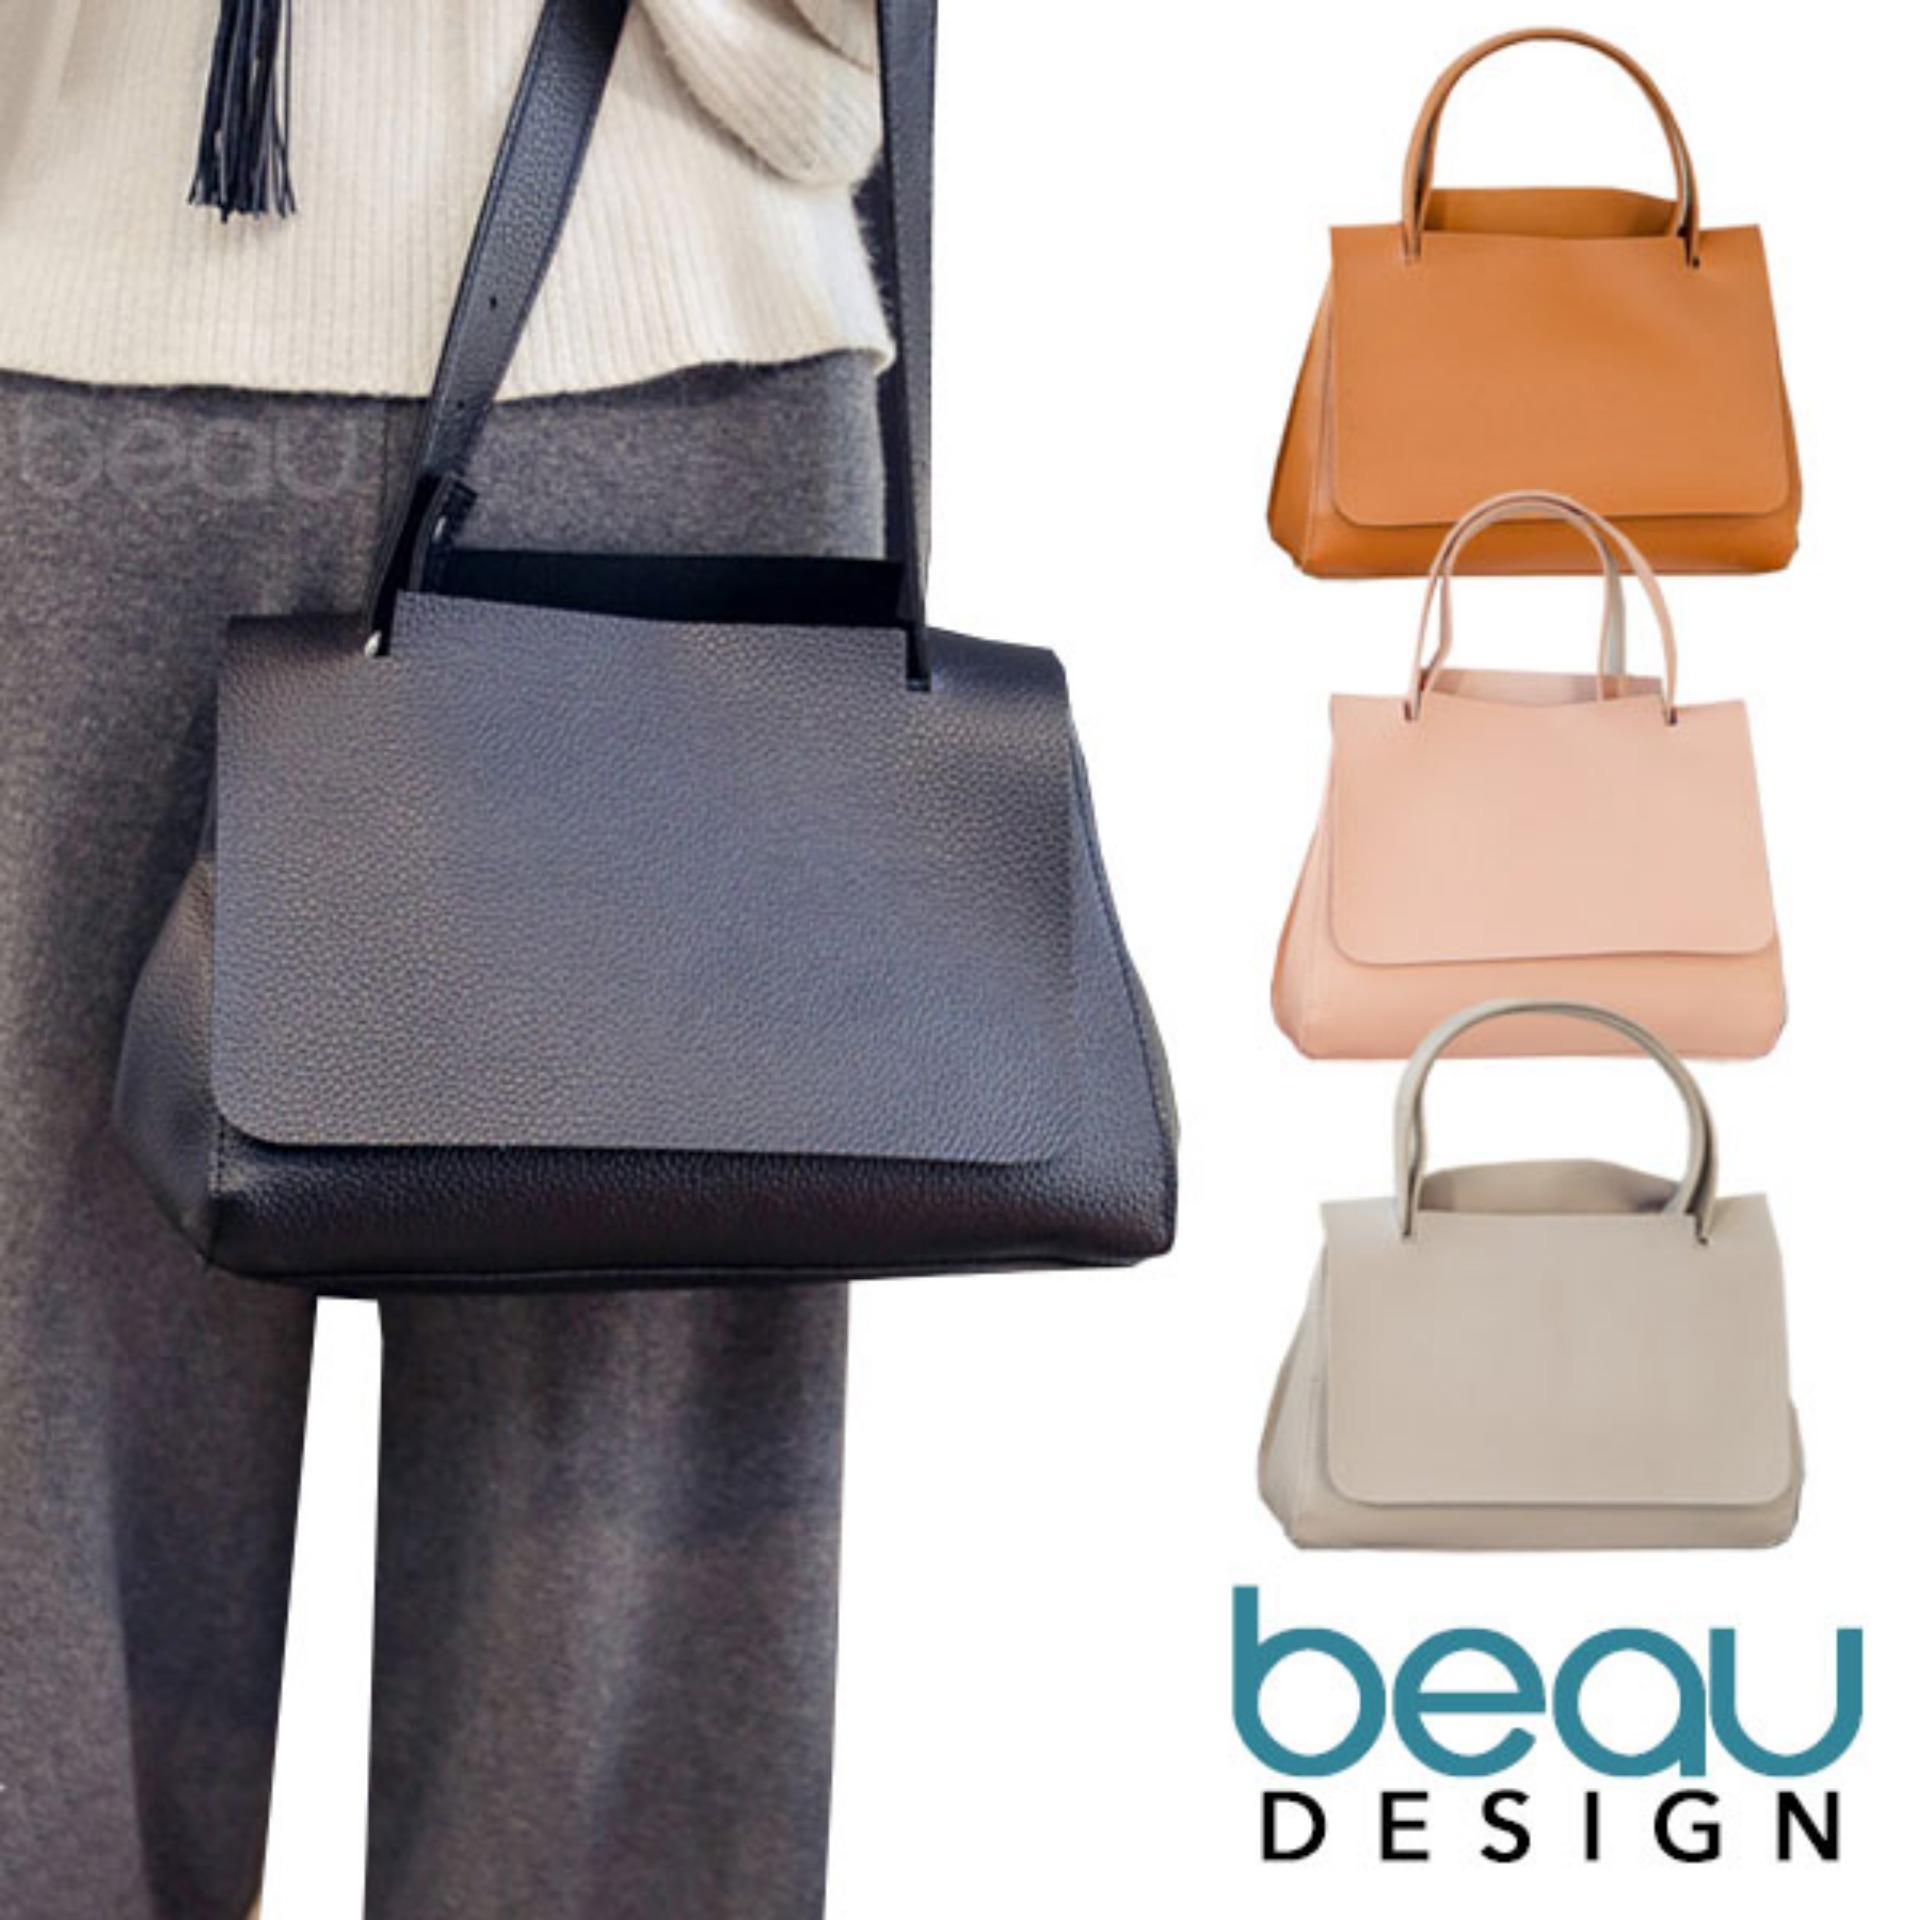 Suitable for any occasion BEAU Tas Wanita Simple Top Handle Bags Handbags